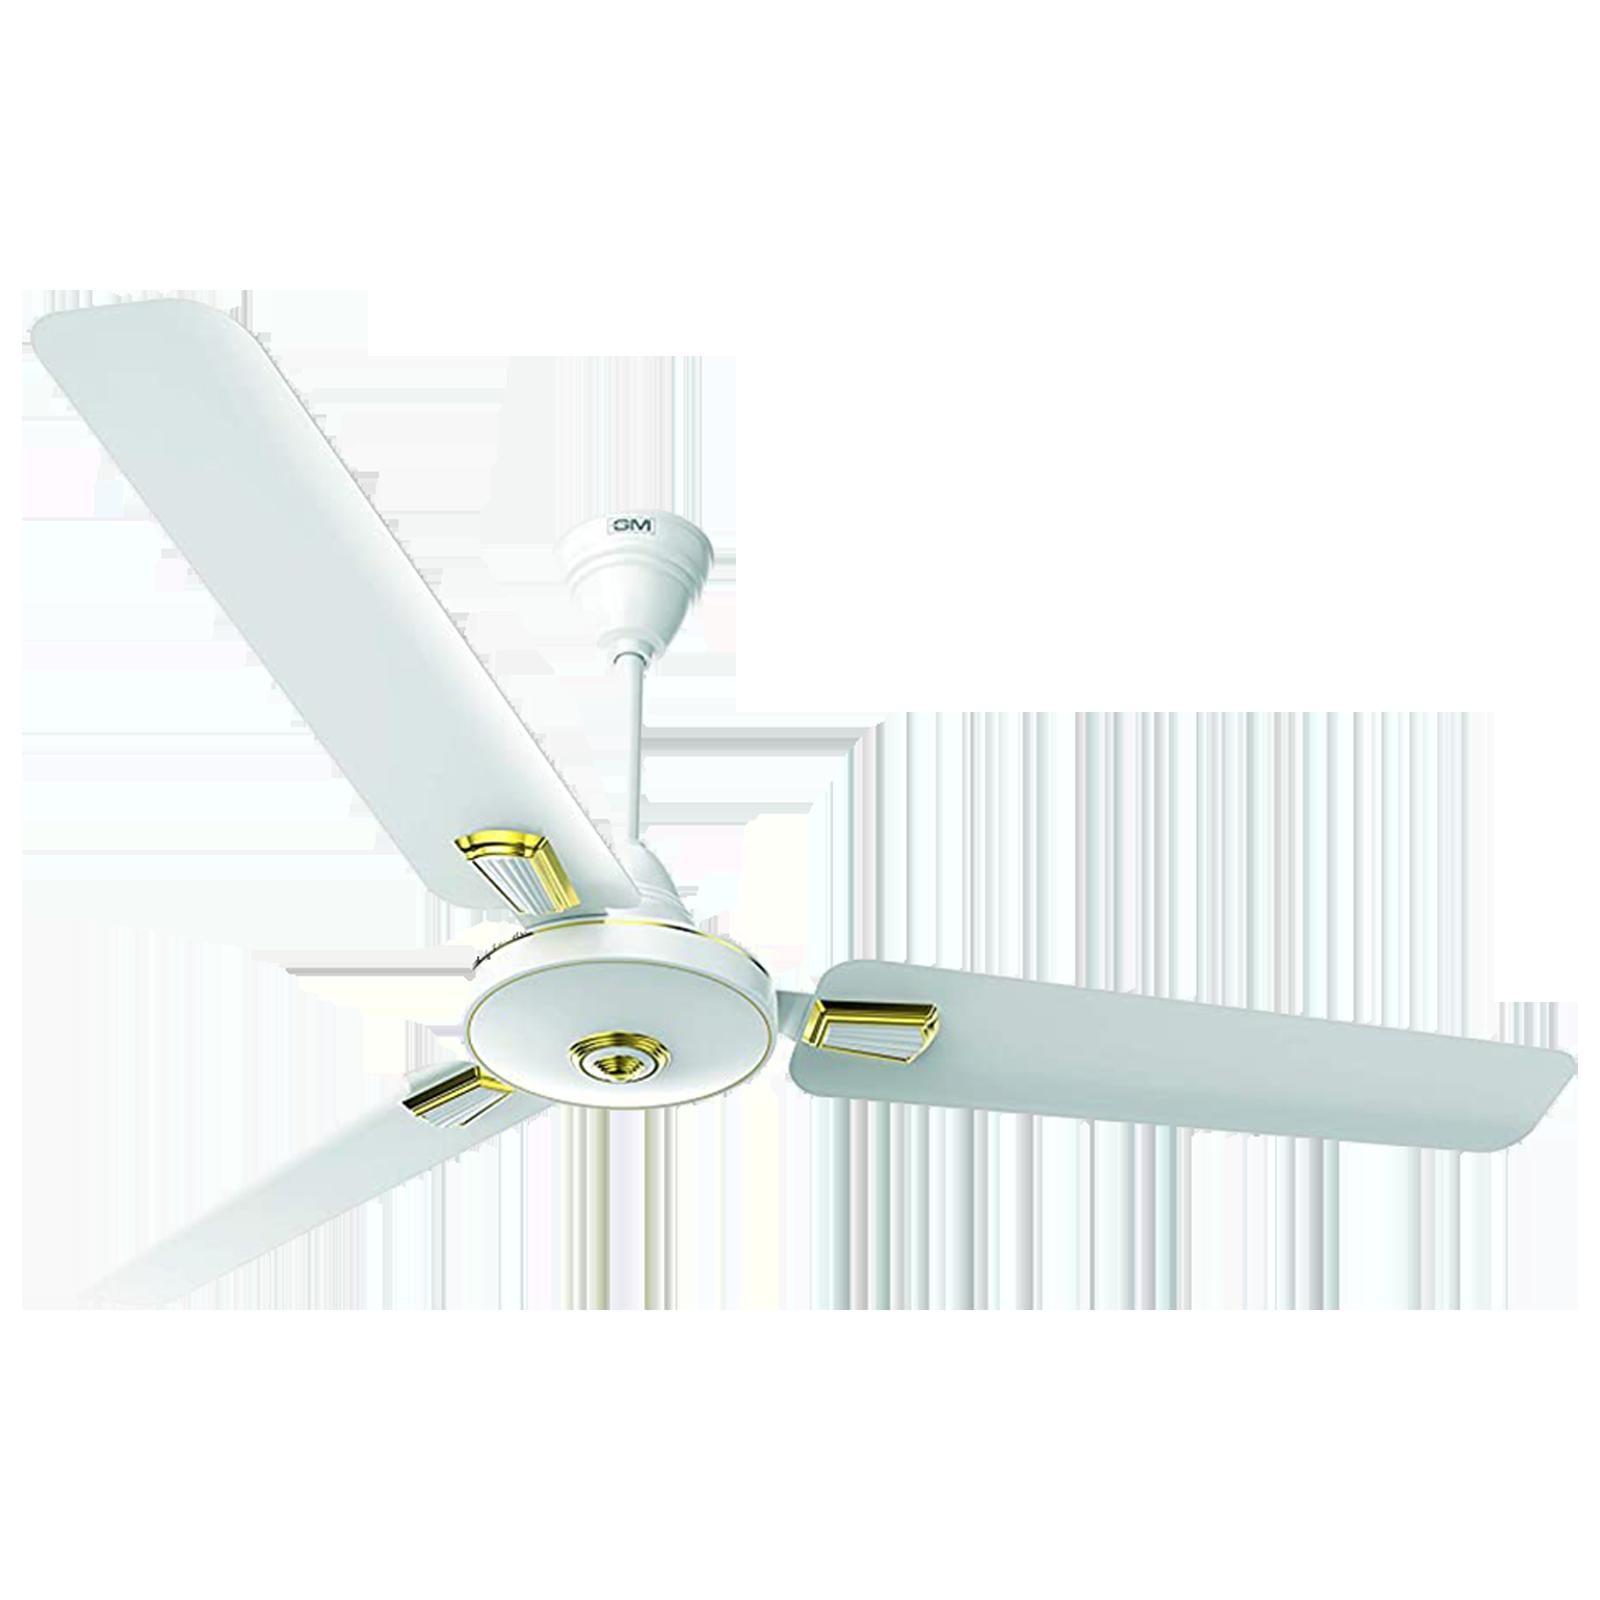 GM AIR9 Plus Deco 120 cm Sweep 3 Blade Ceiling Fan (Aerodynamically Designed Blades, CFB480033WHGL, White)_1